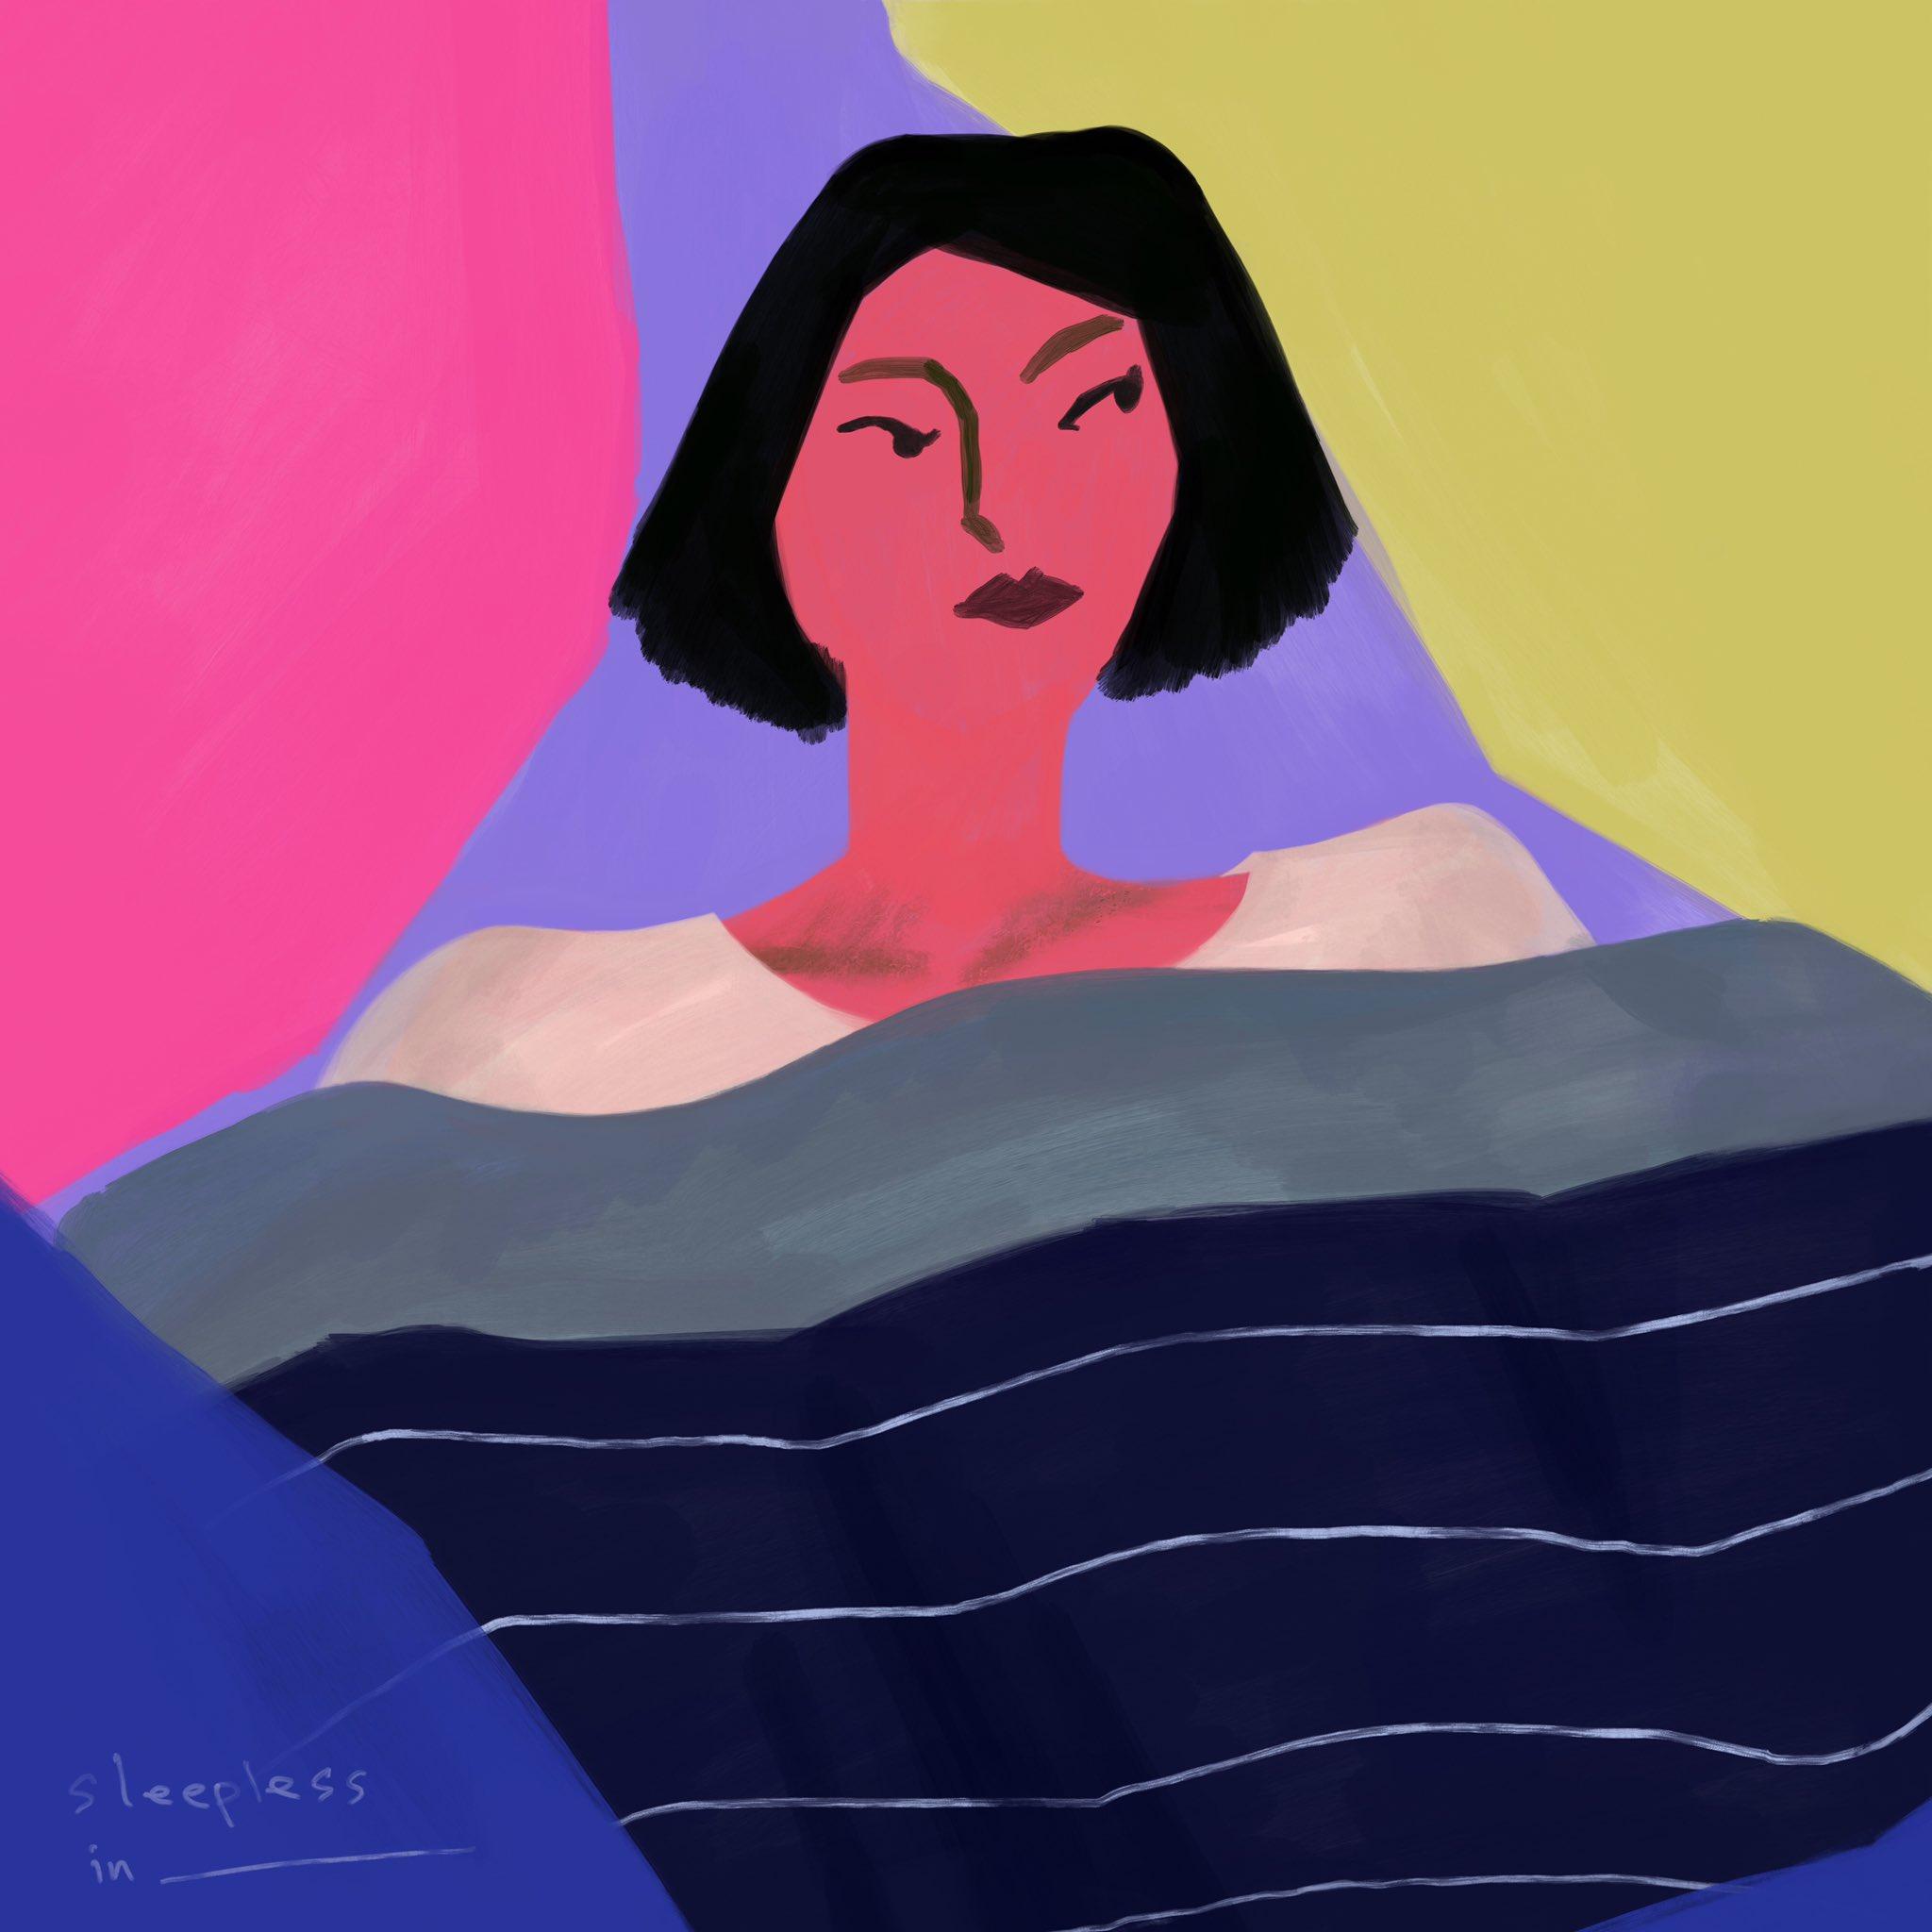 Epik High's sleepless in __________ is the album for #WorldSleepDay https://t.co/hb3LU8wrPL